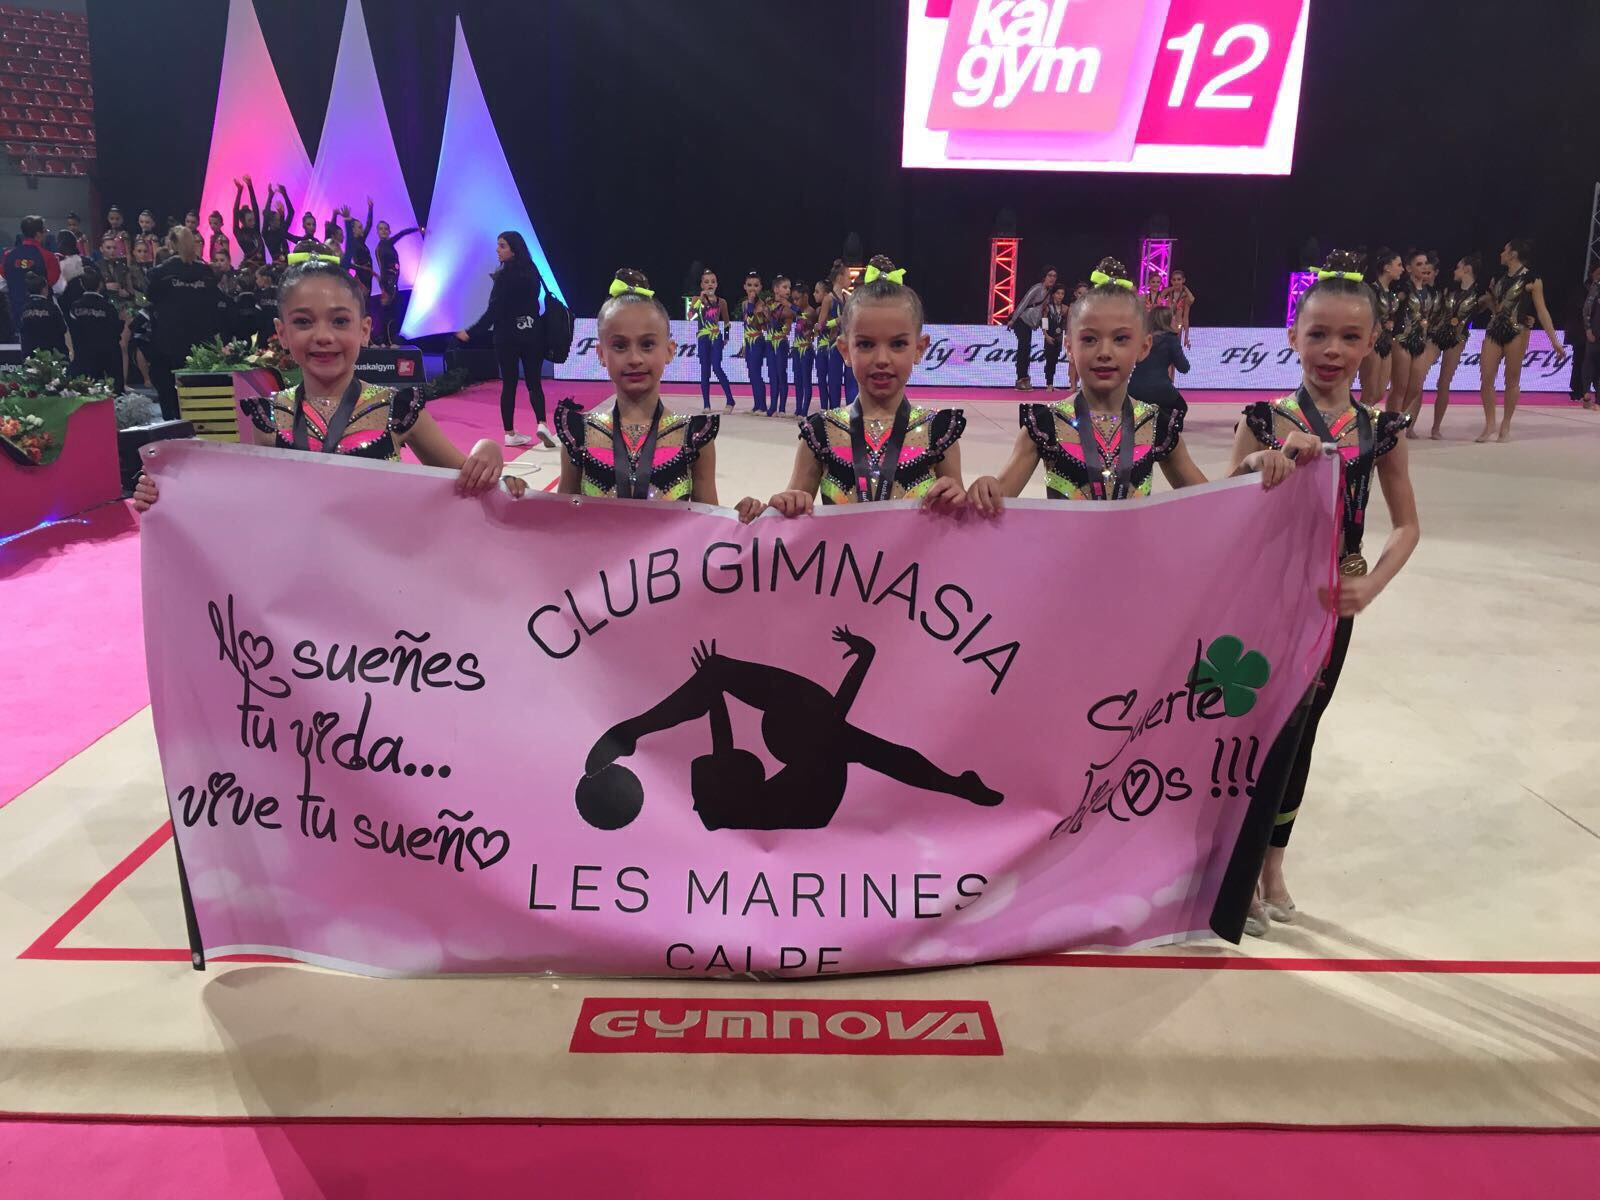 Club Les Marines